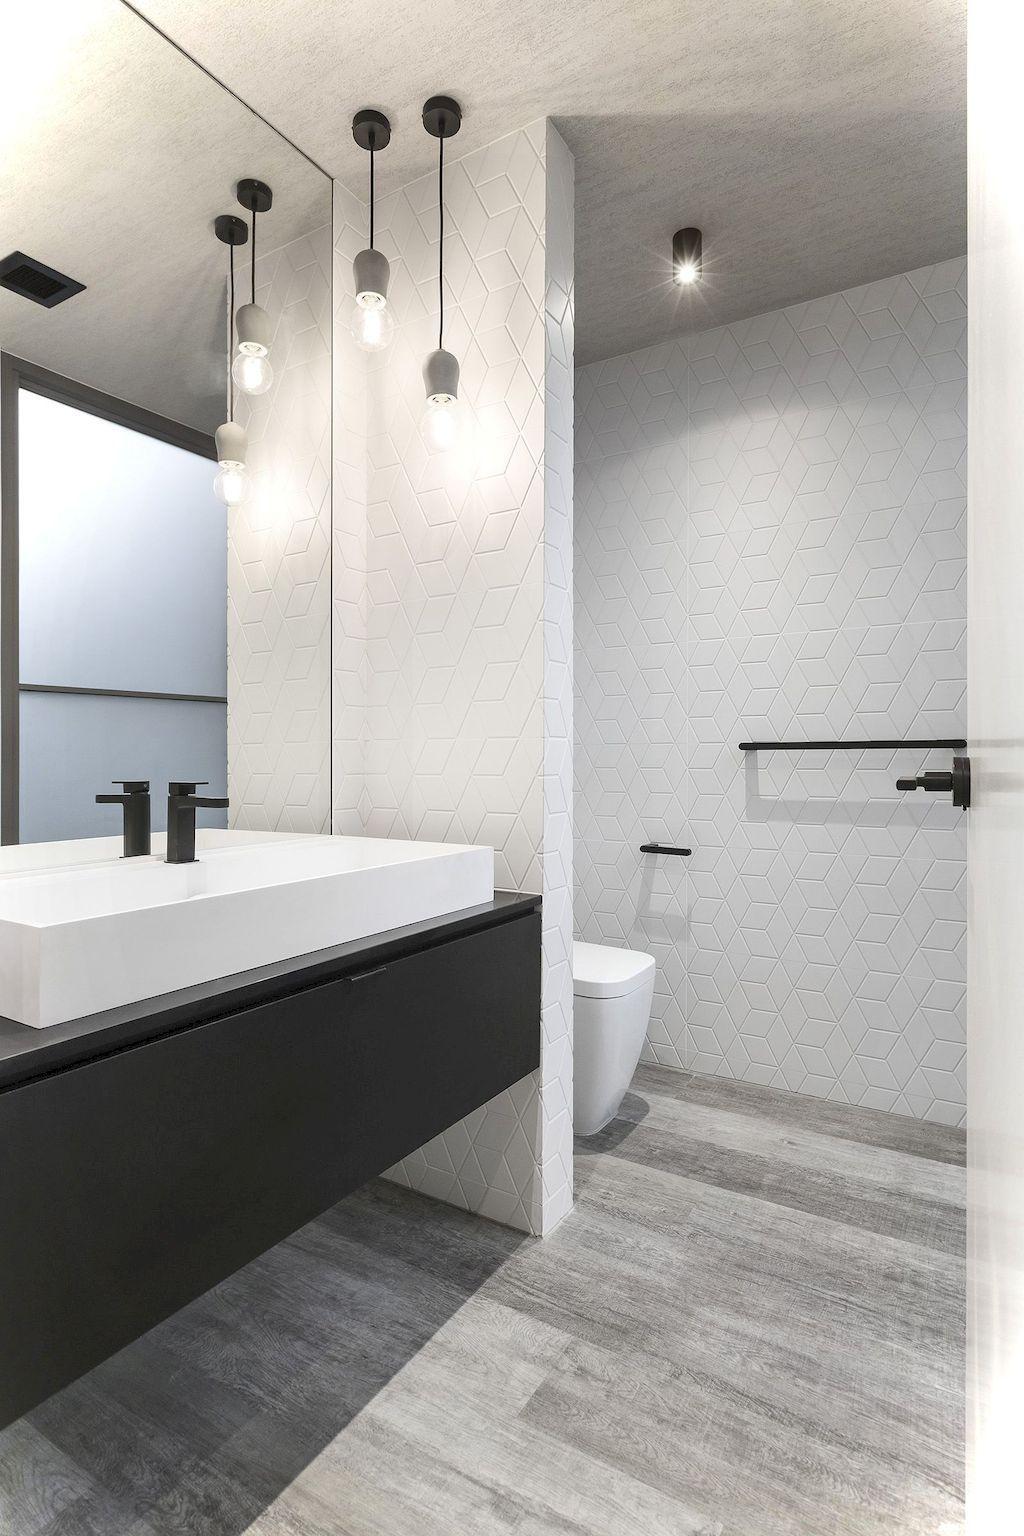 93 Cool Black And White Bathroom Design Ideas 2 Business Decor